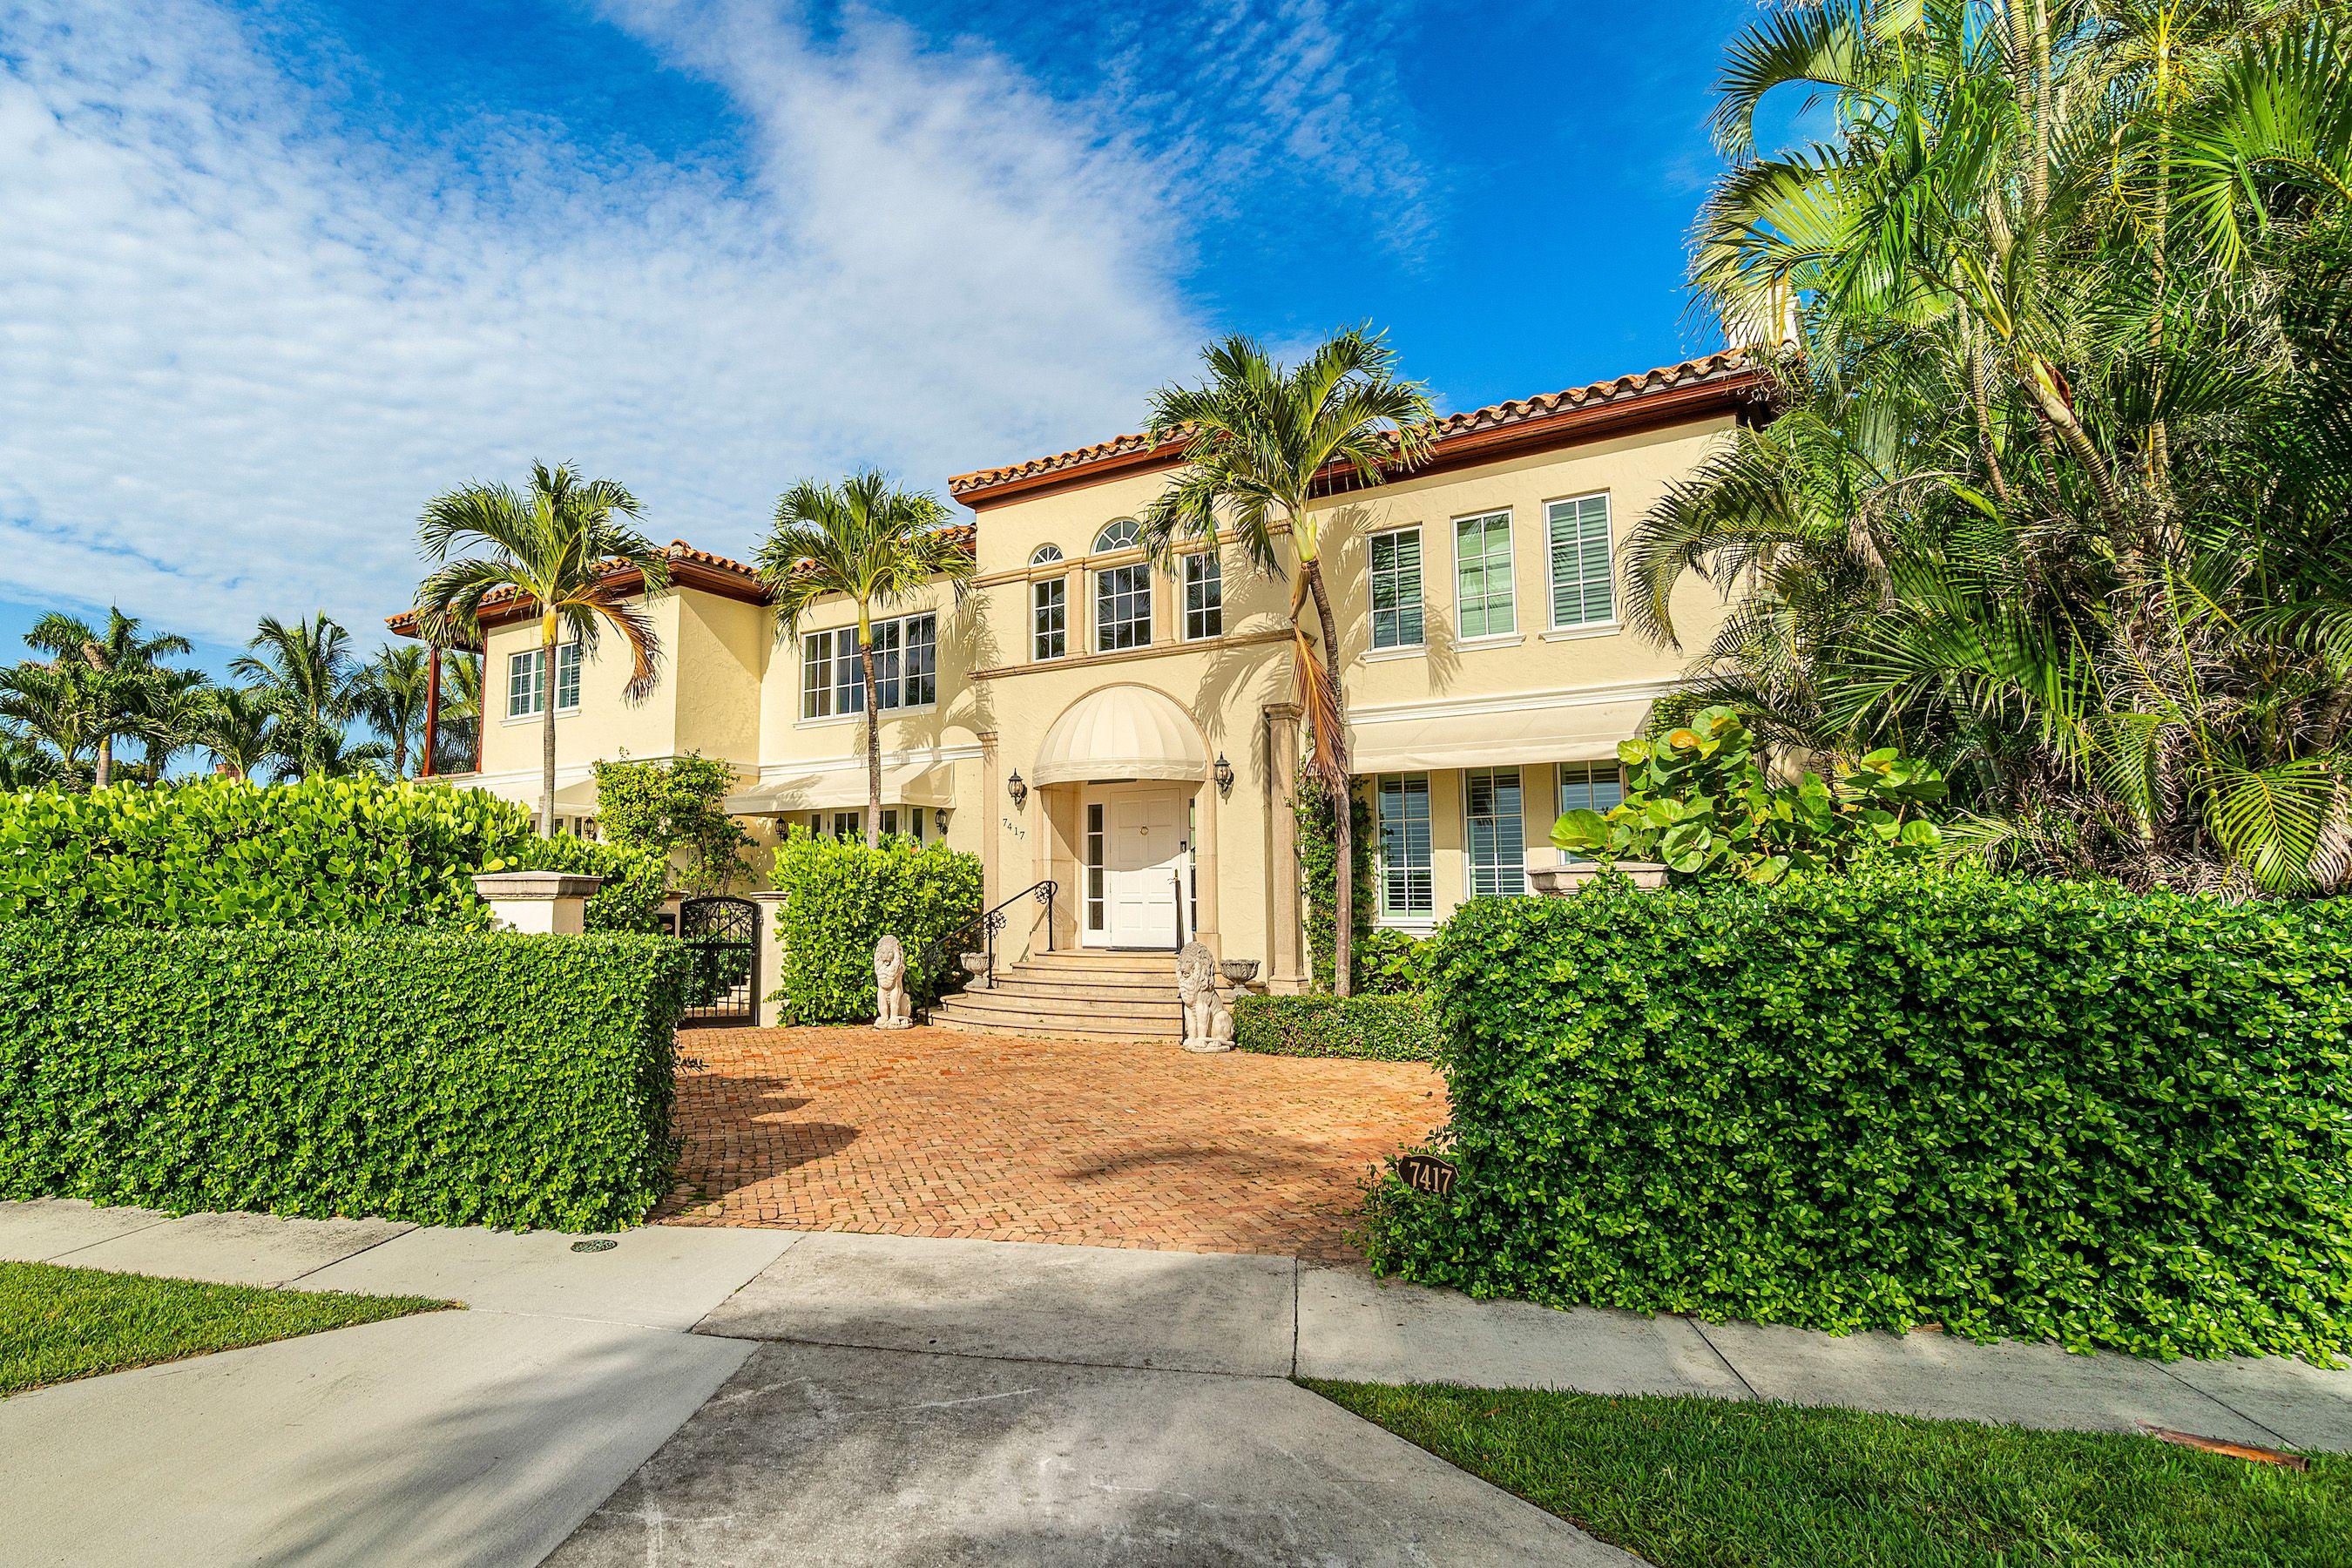 Kips Bay Decorator Show House Palm Beach 2021 Announcement